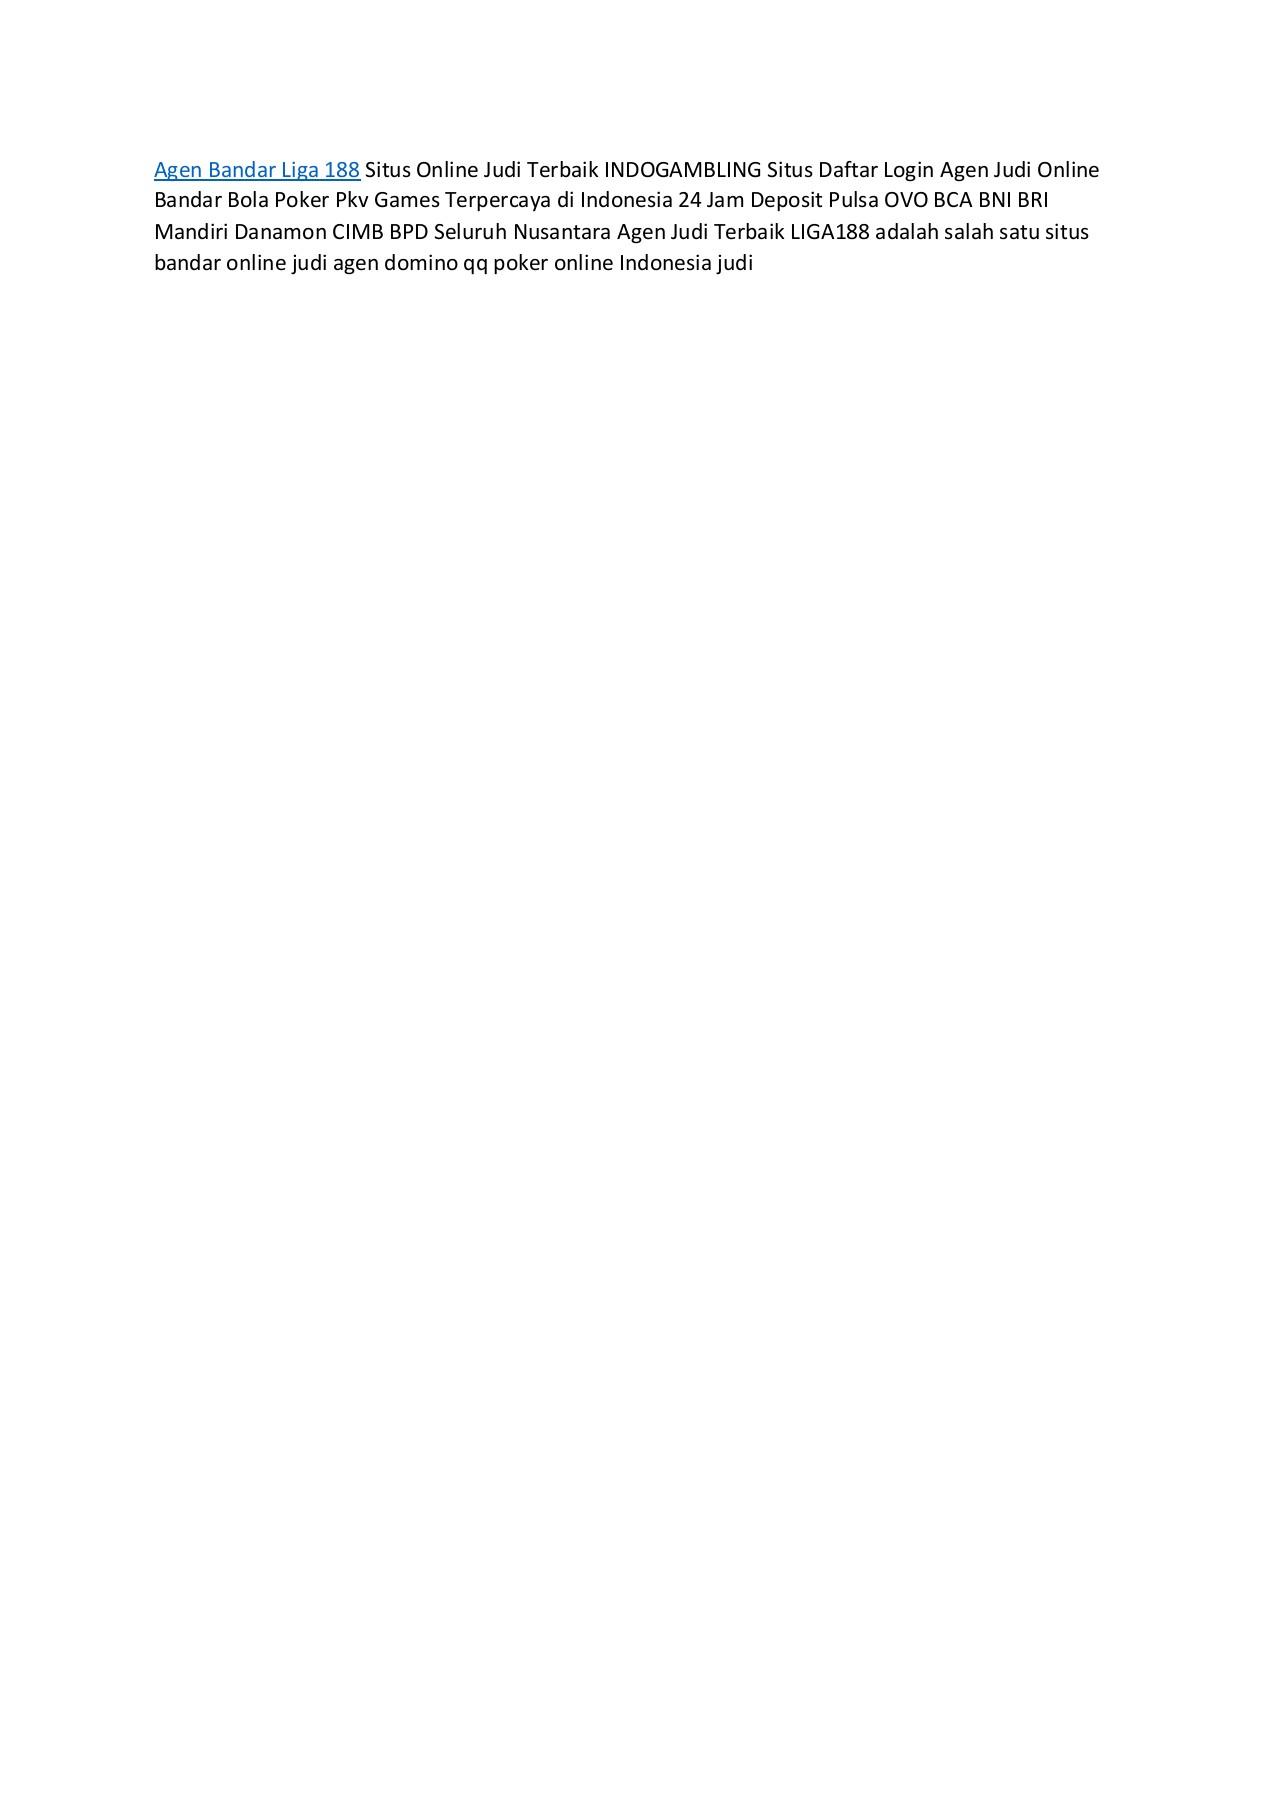 Agen Bandar Liga 188 Majudori77 Flip Pdf Online Pubhtml5